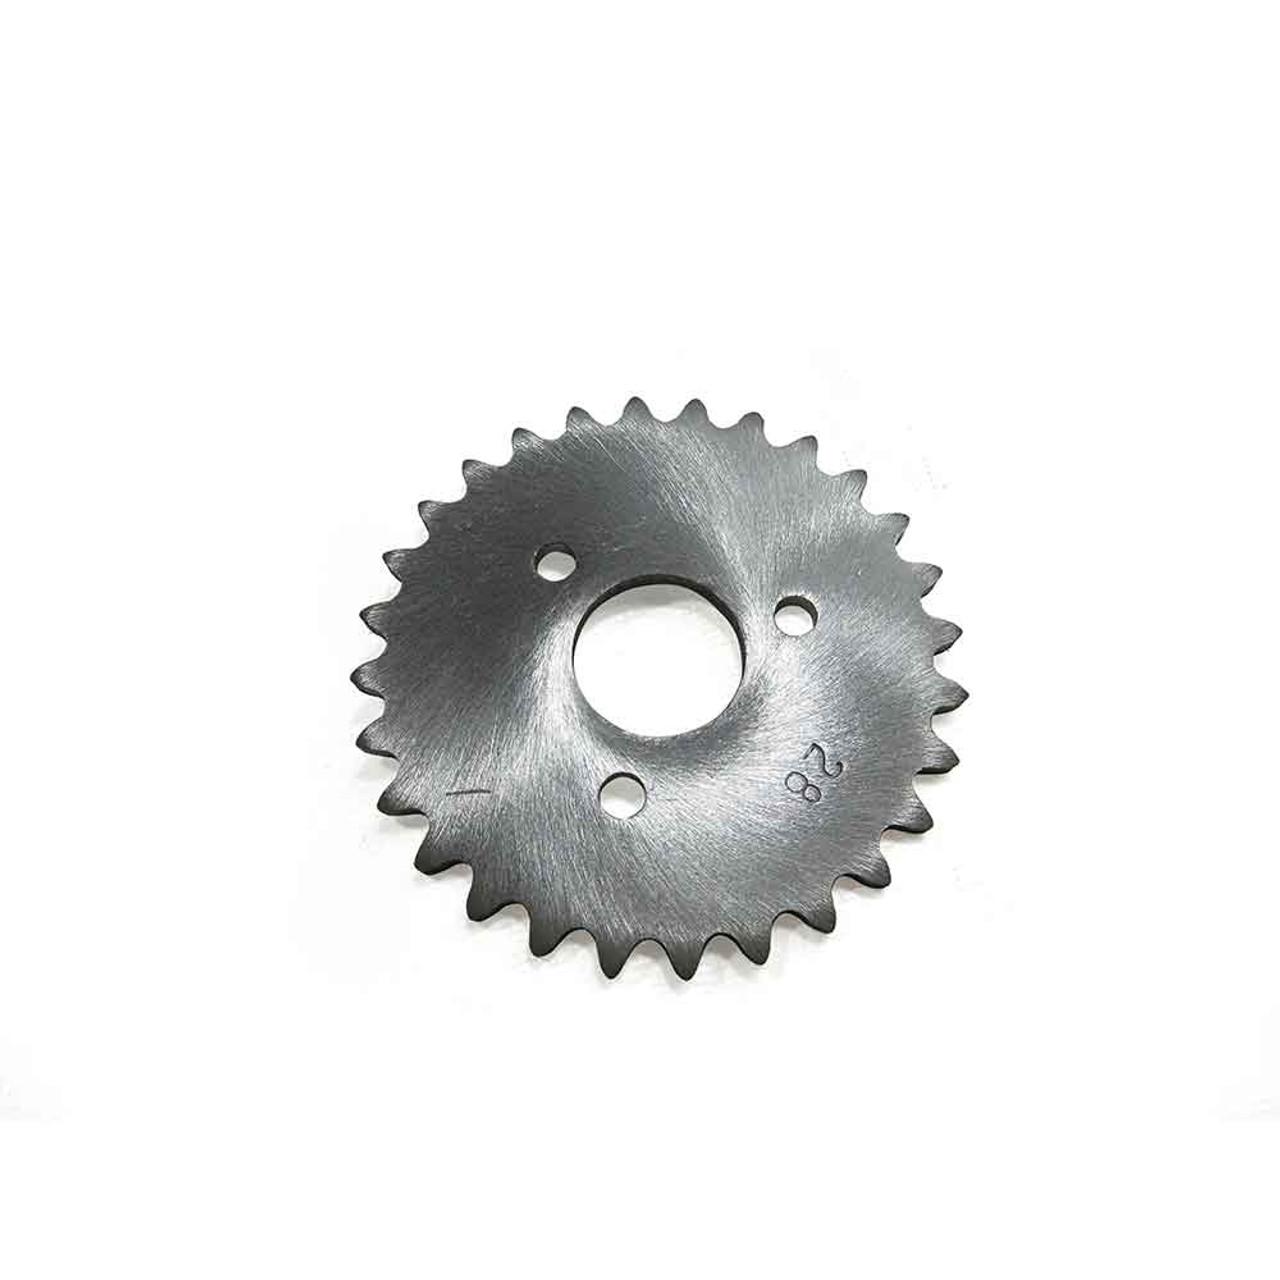 "28 Tooth Sprocket, Aluminum, #35 Chain, P5256 - 1"" Bore, 1.687"" Bolt Circle"